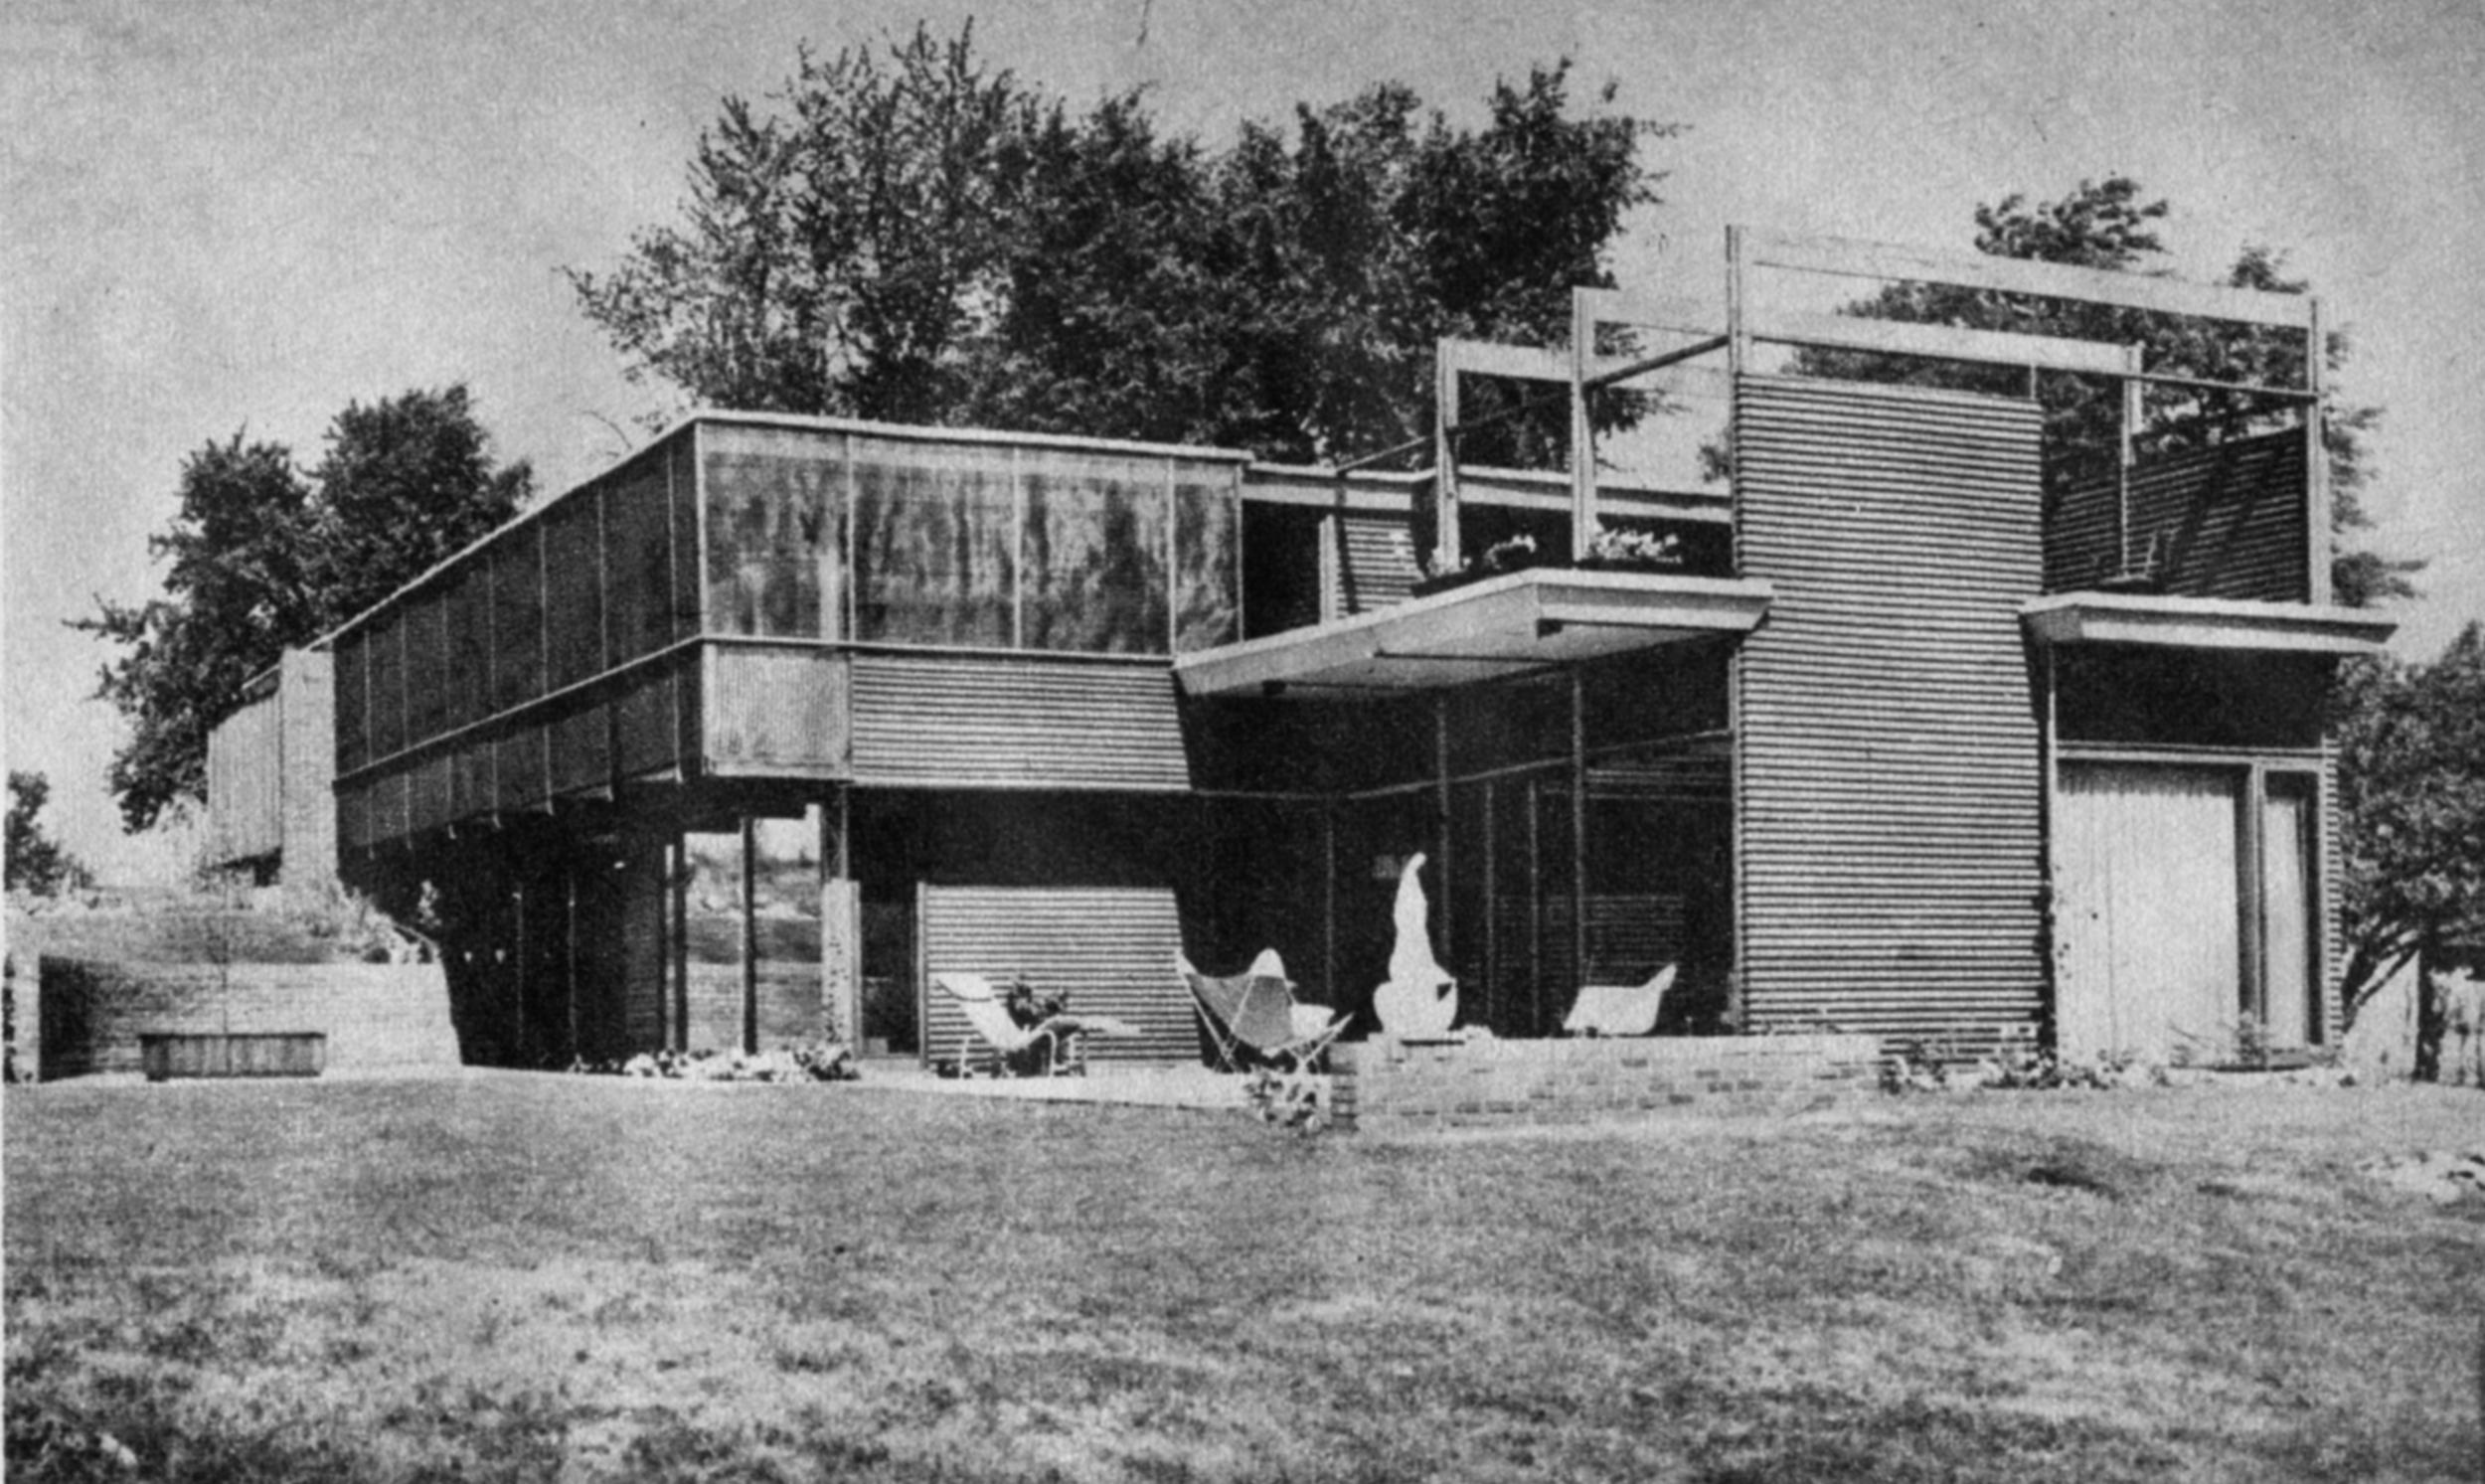 David B. Runnells Personal Residence - Fairway Kansas -Demolished - Architect, David B. Runnells